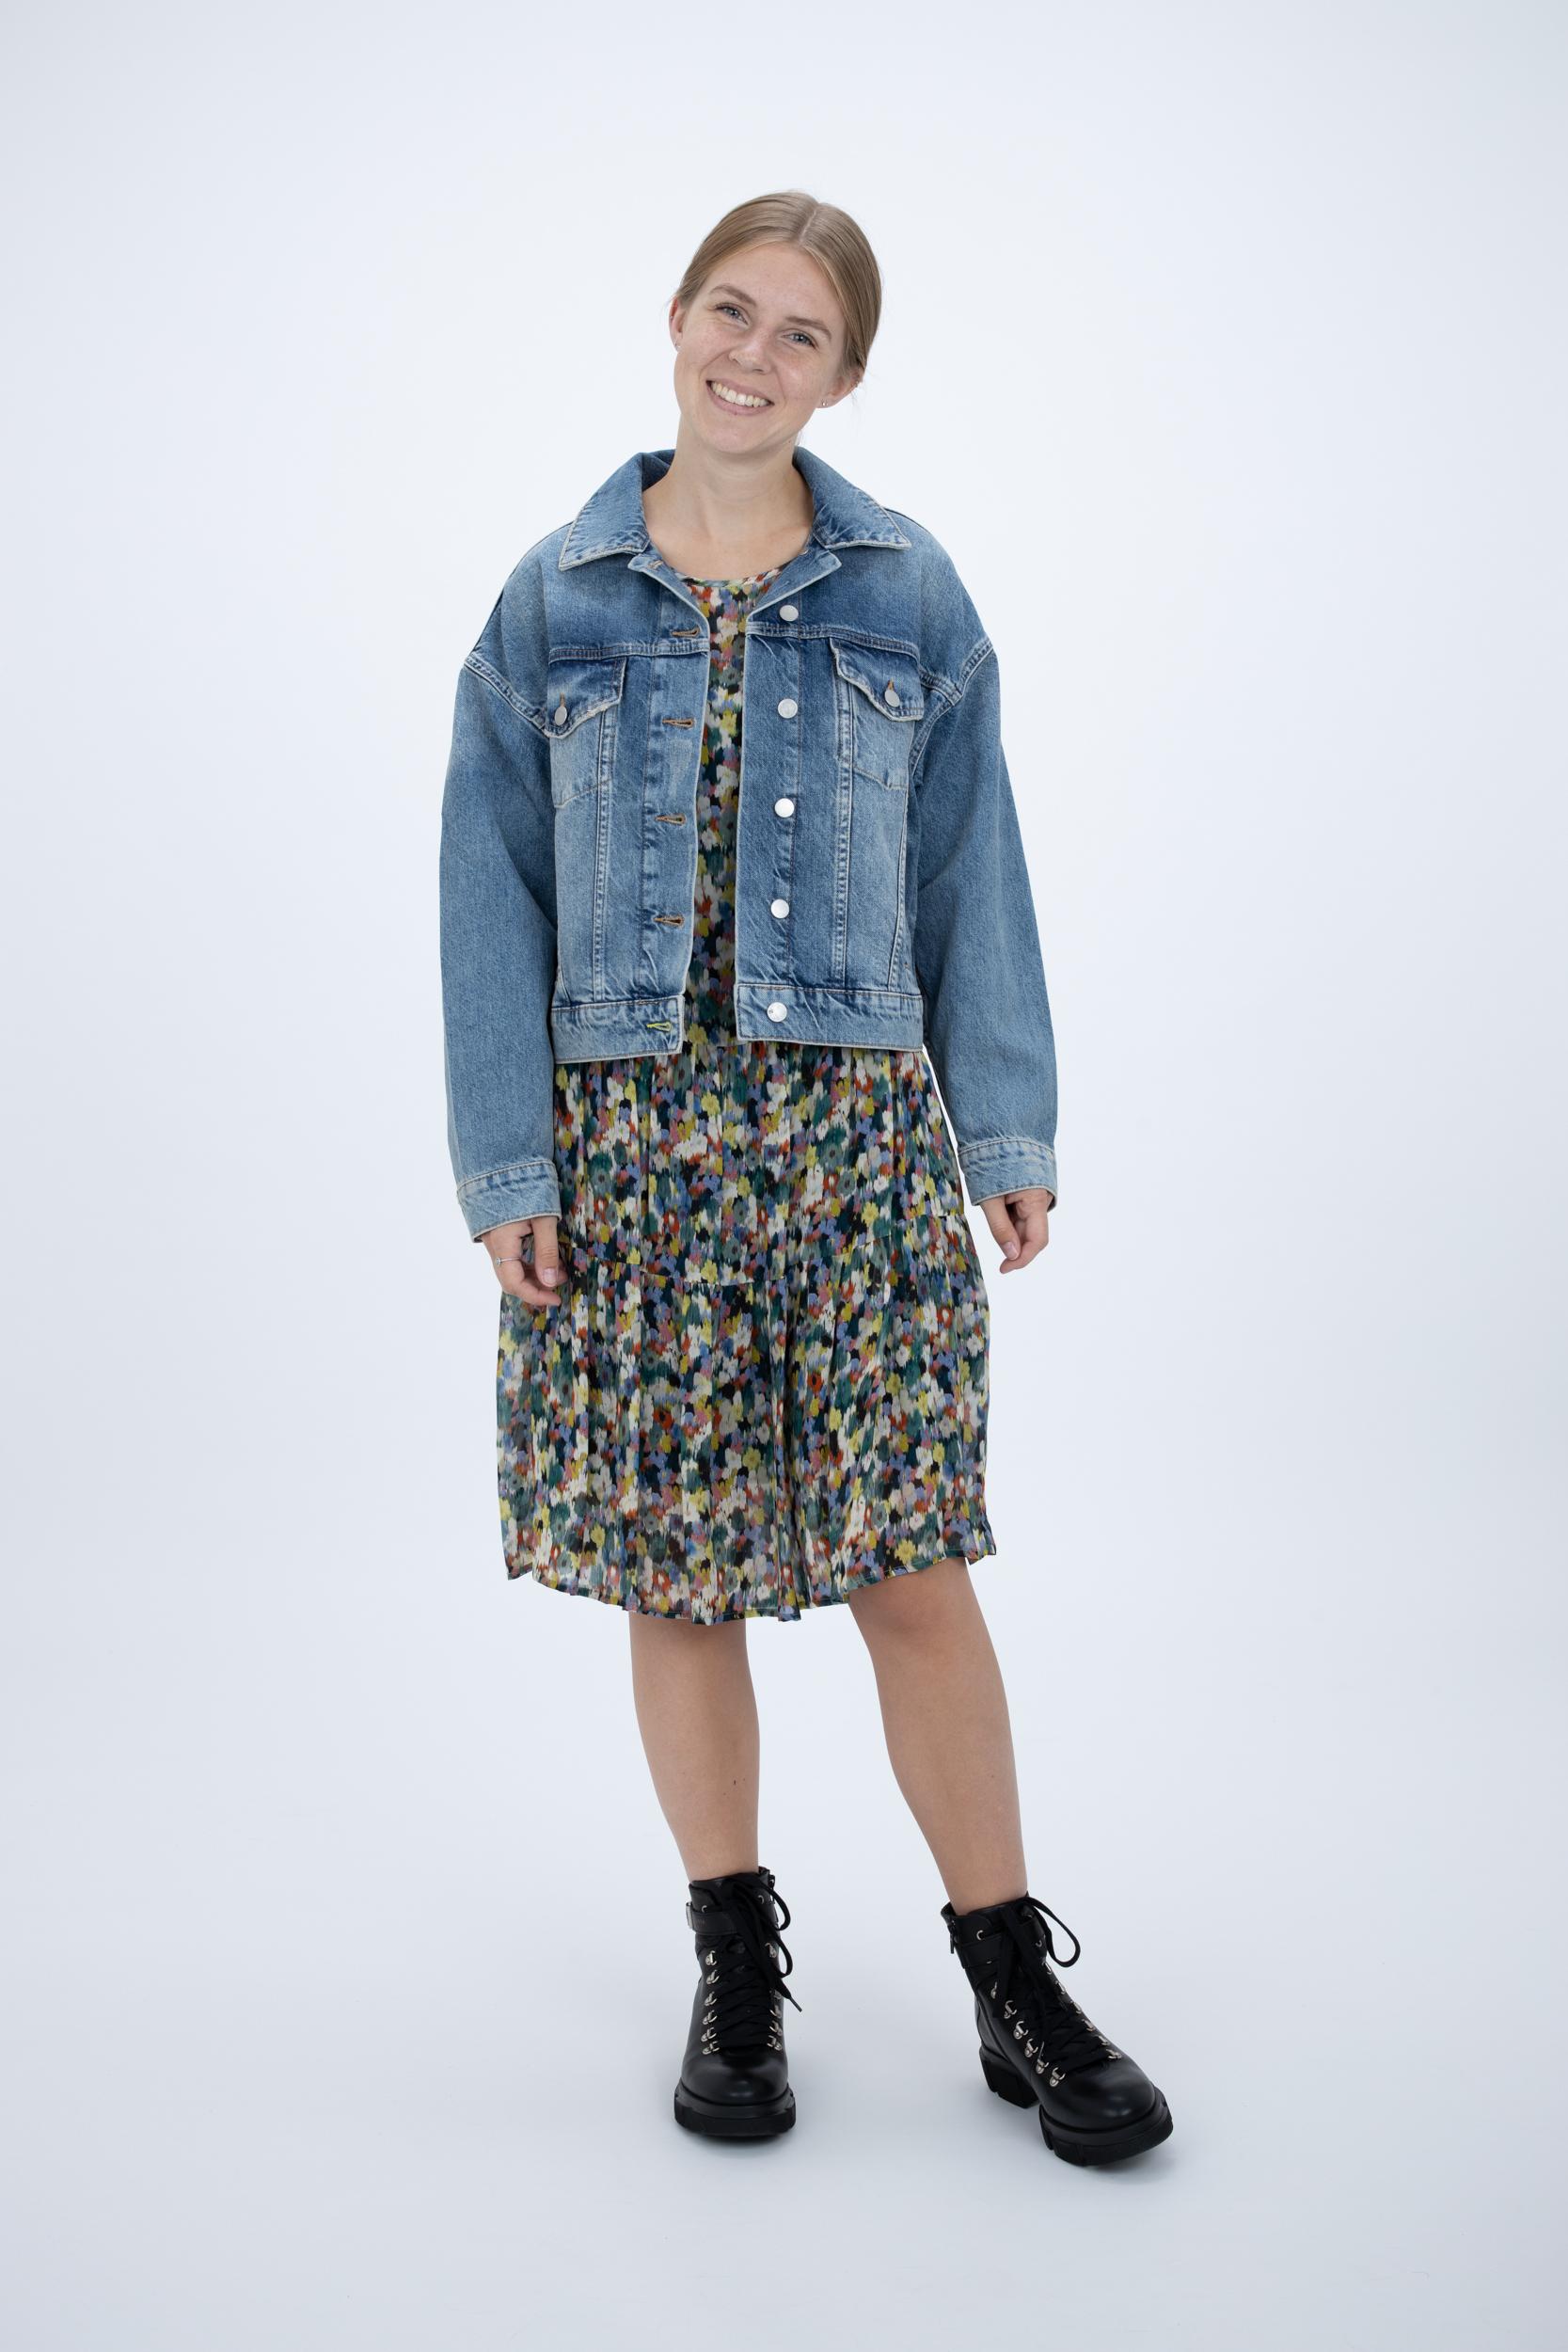 Jeansjacke mit weitem Fit